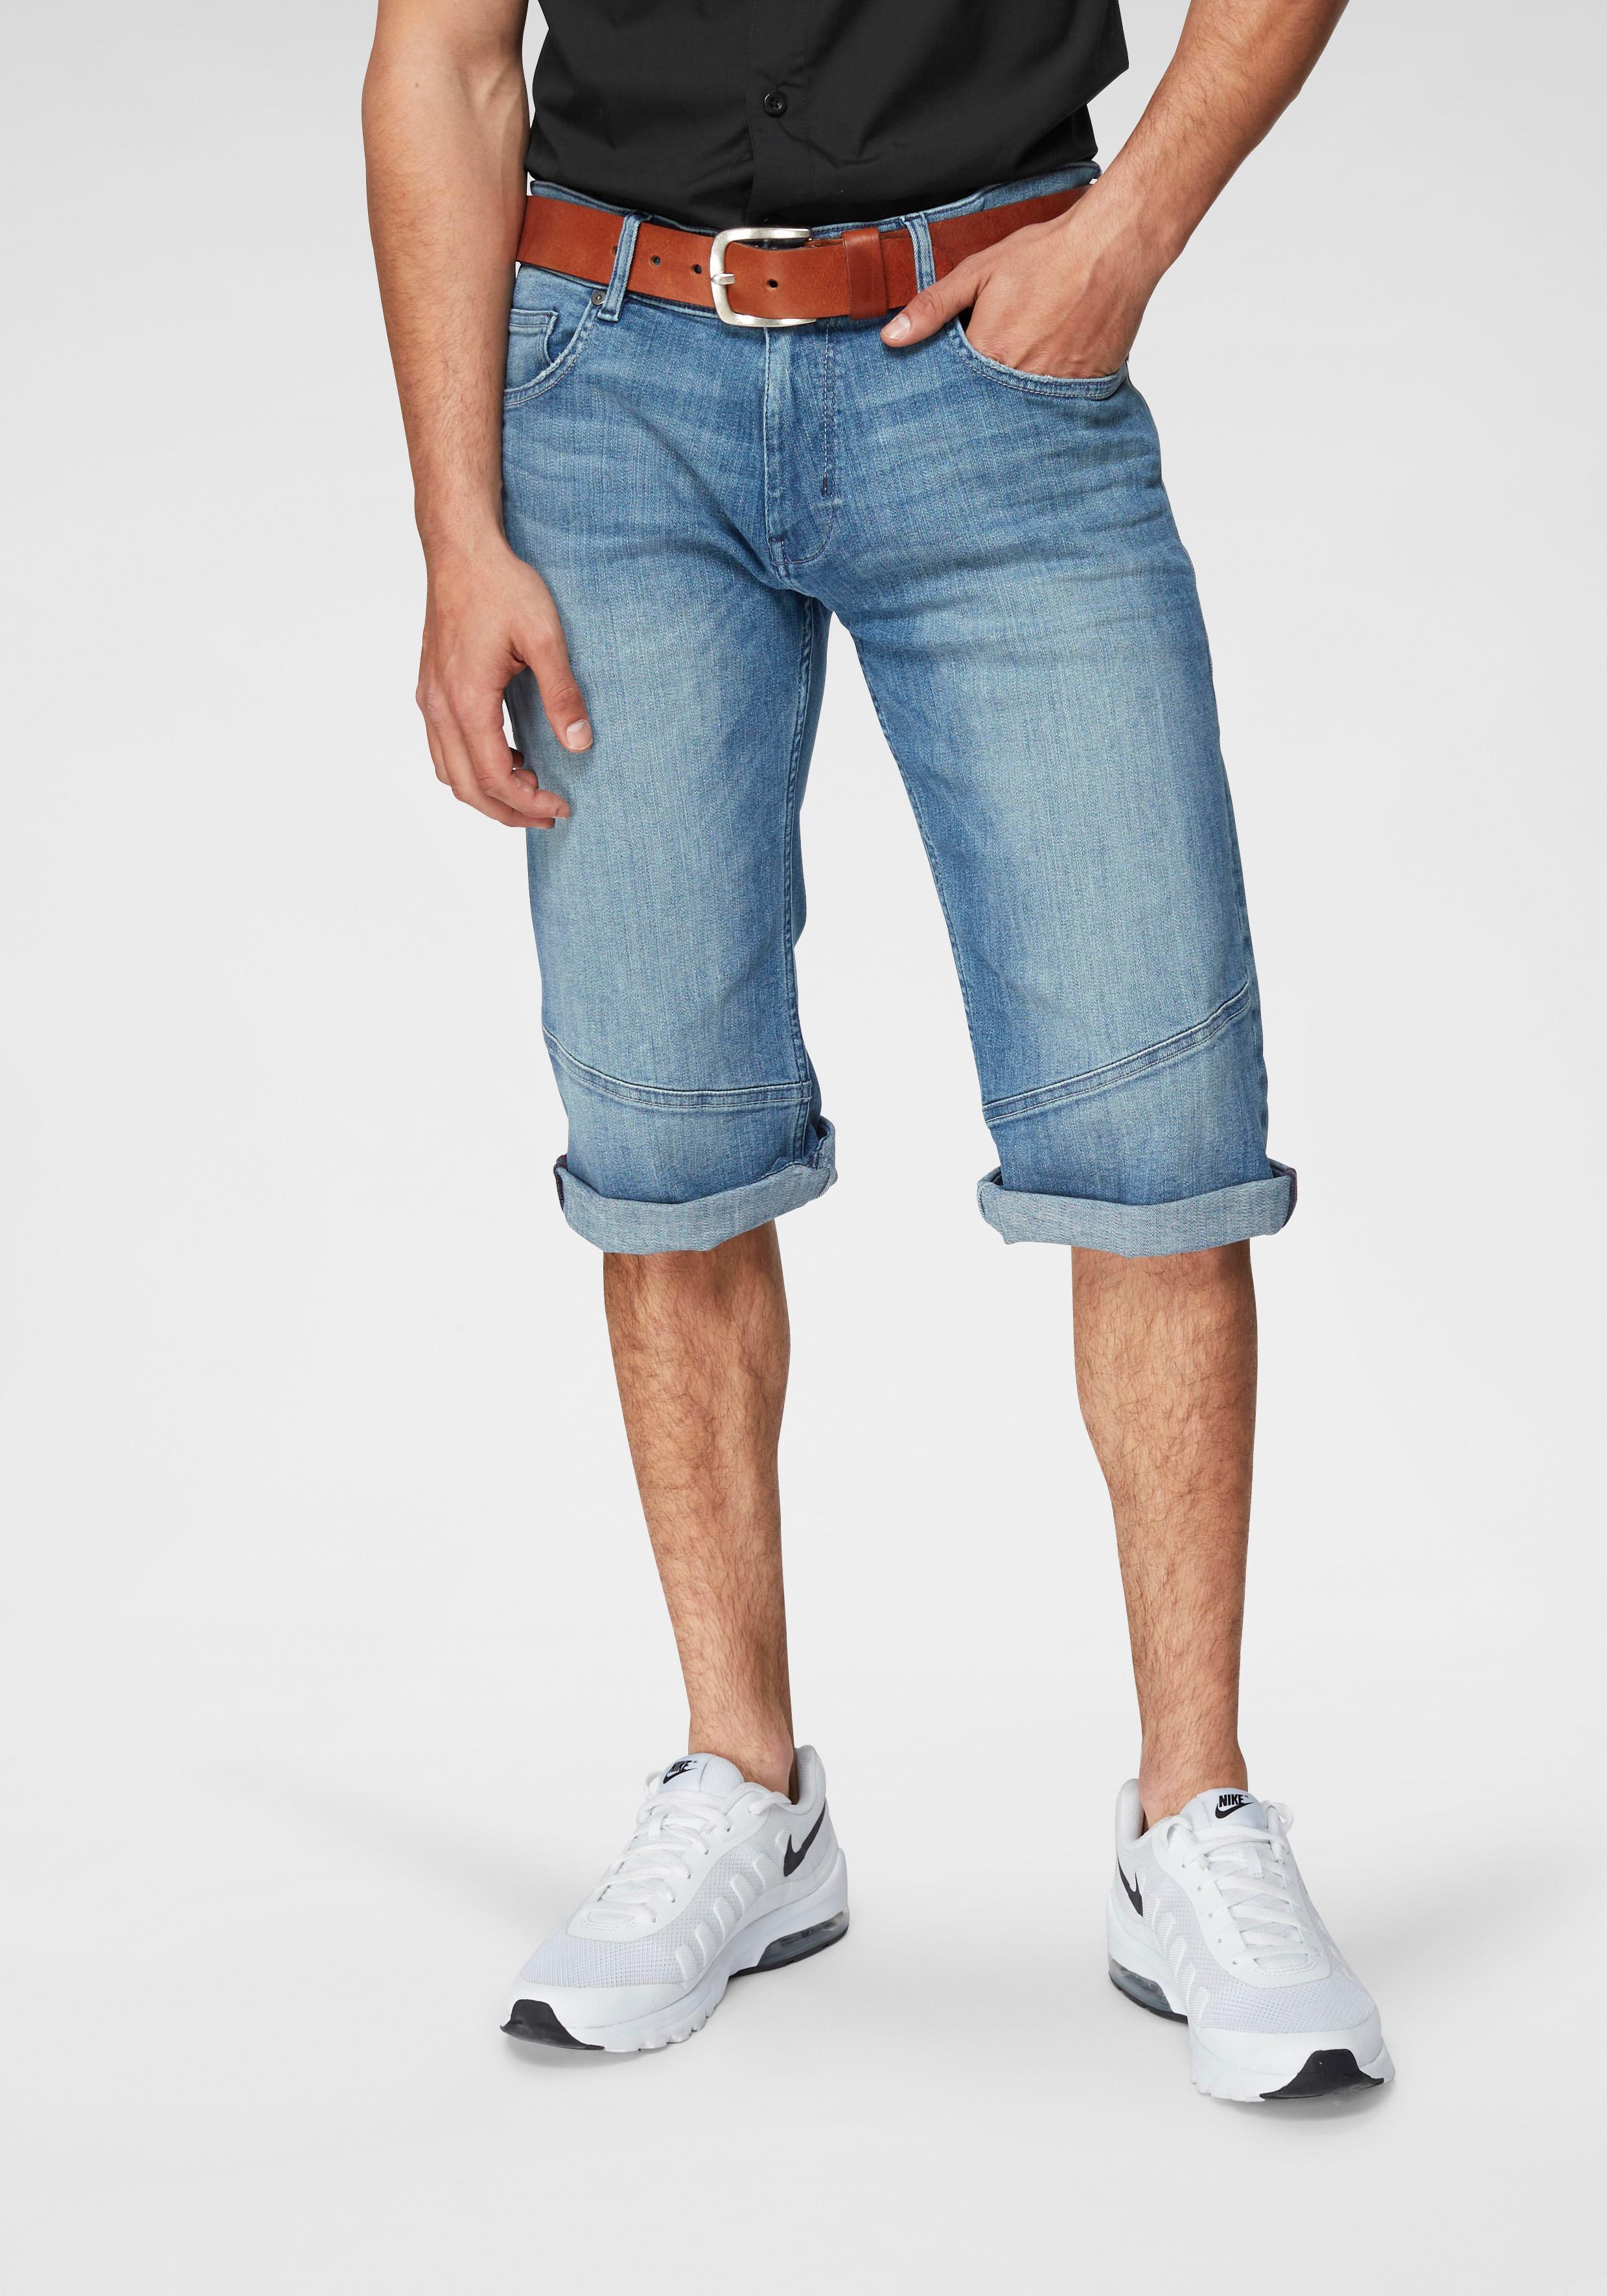 edc by Esprit Jeansbermudas | Bekleidung > Shorts & Bermudas > Jeans Bermudas | Edc By Esprit